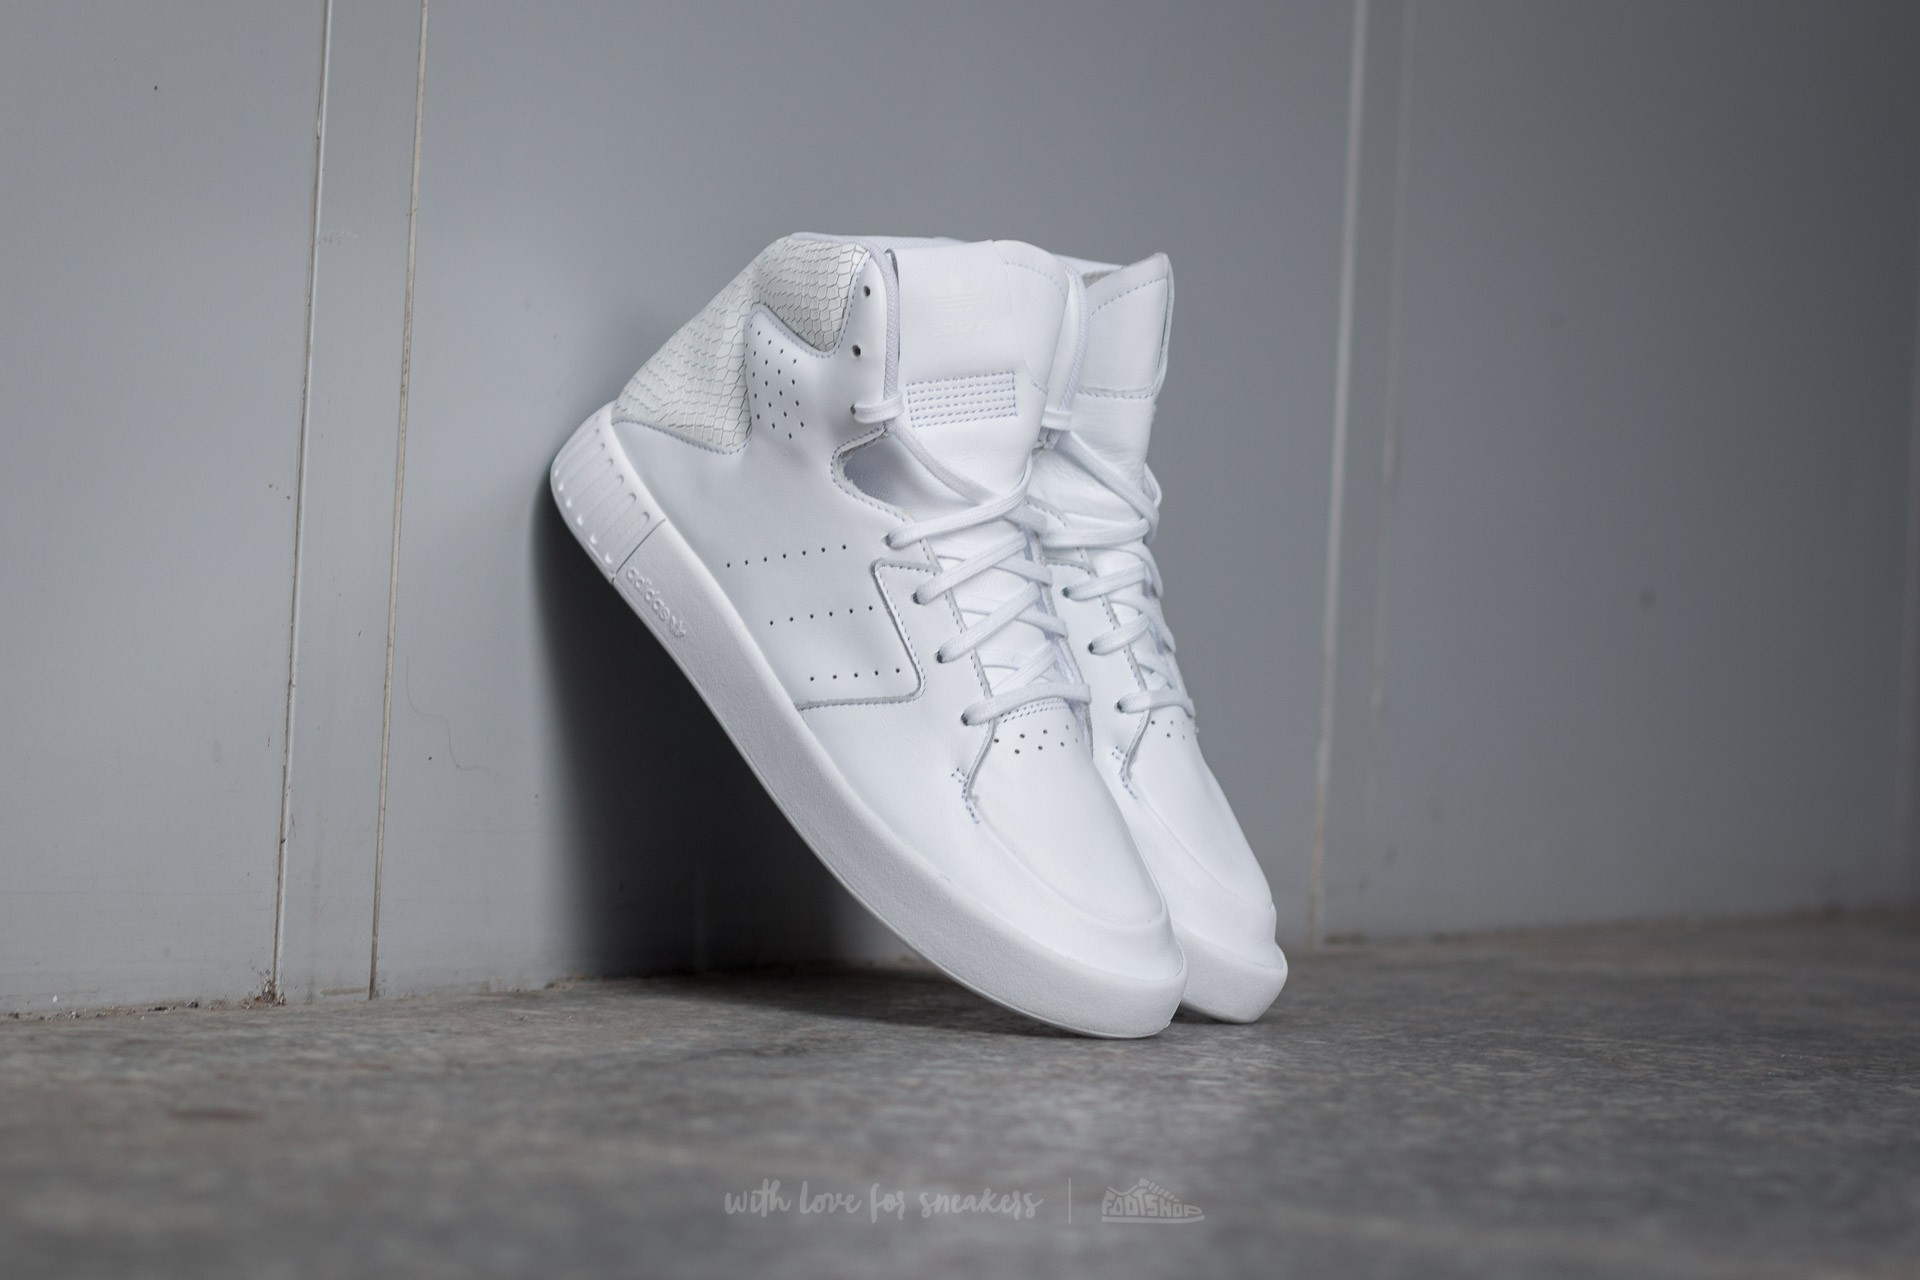 brand new 13033 de4a3 adidas Tubular Invader 2.0 W Ftw White/ Ftw White/ Ftw White ...